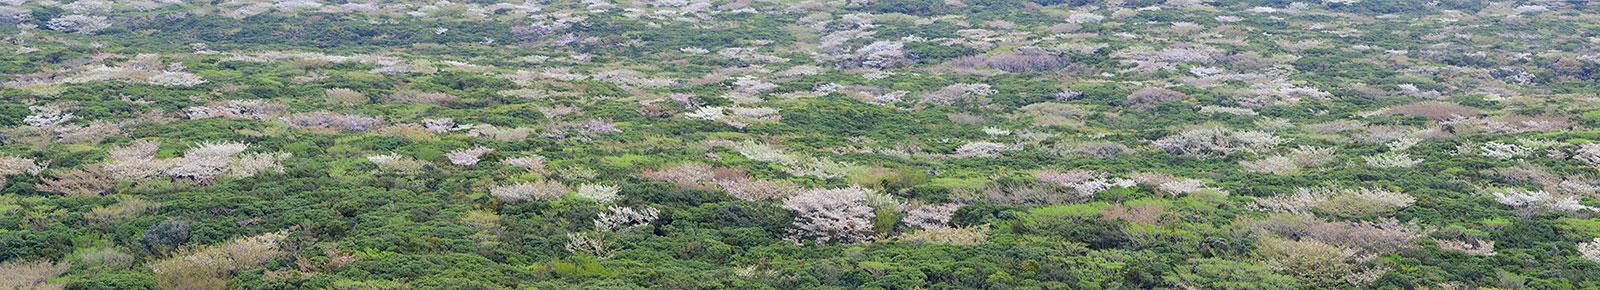 Blossoming trees on Izu Oshima, an island a few kilometers off the east coast of Japan's Izu Peninsula.